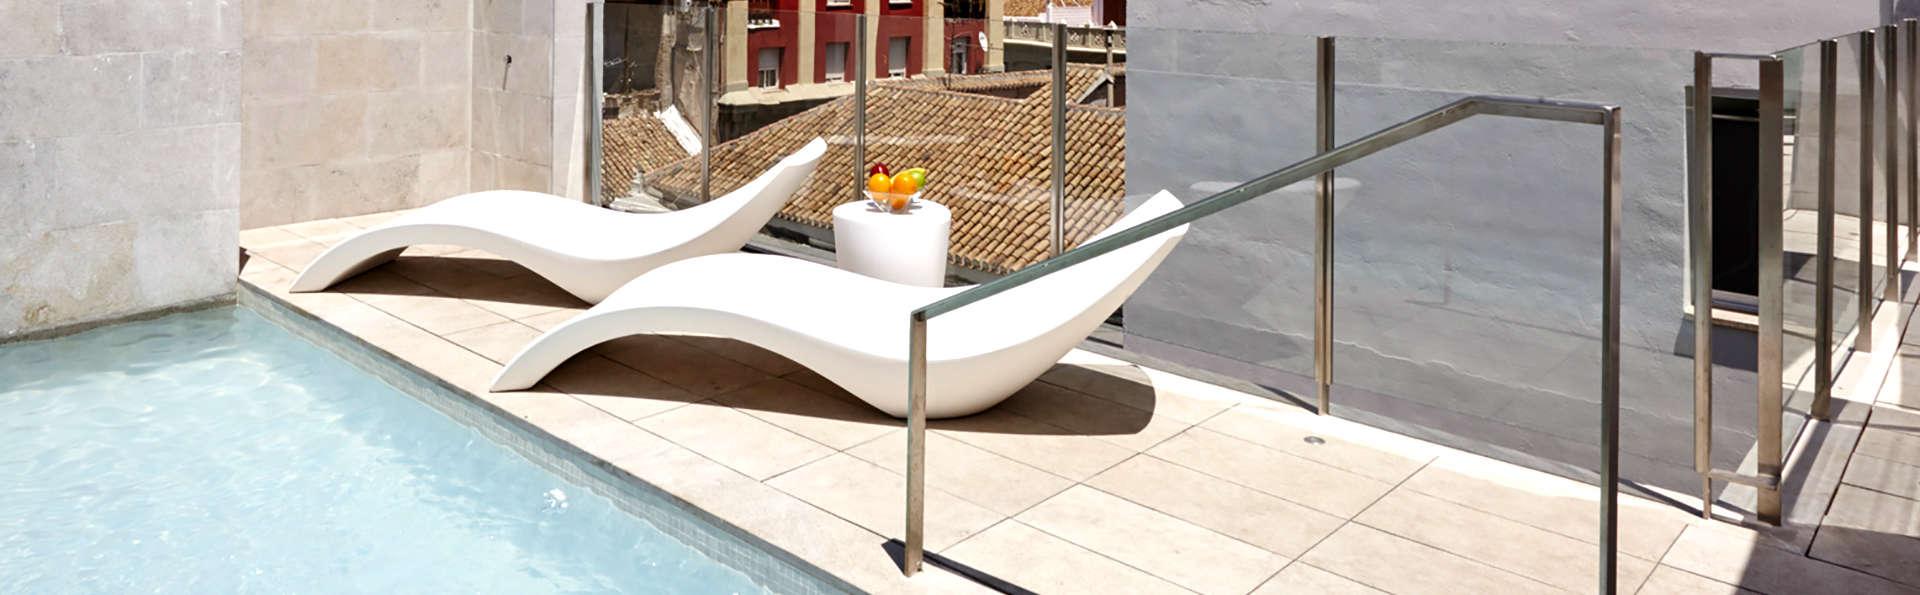 Granada Five Senses Rooms & Suites - Edit_Terrace.jpg